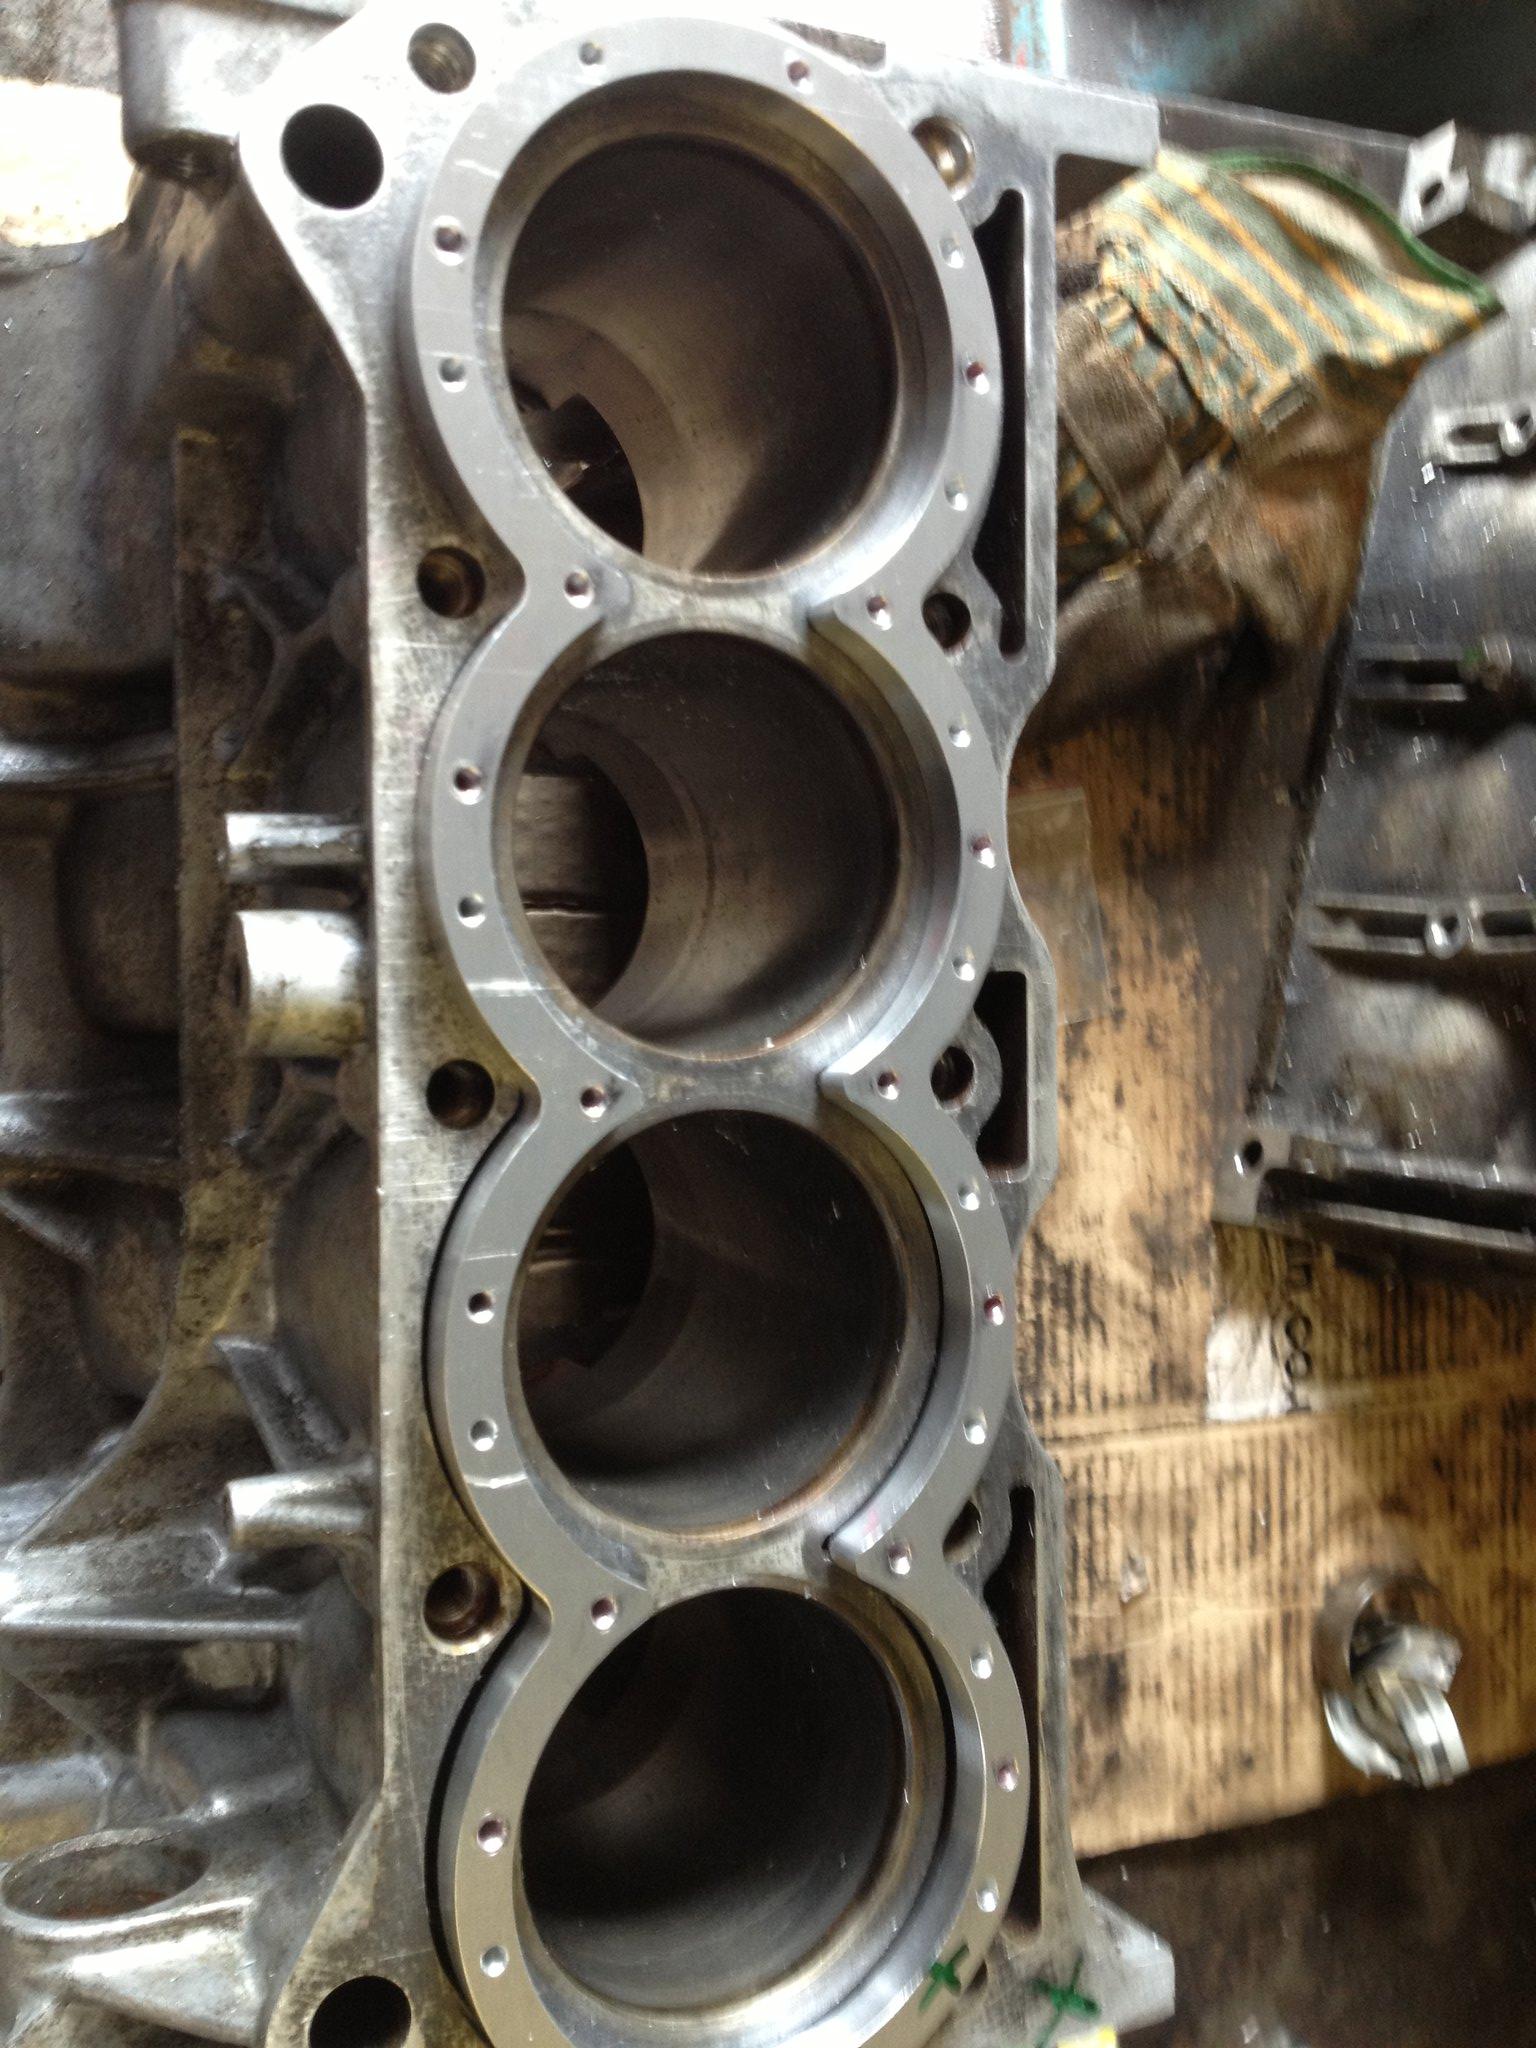 mk1 Gti AWD turbo build 50891475203_101acd0973_k